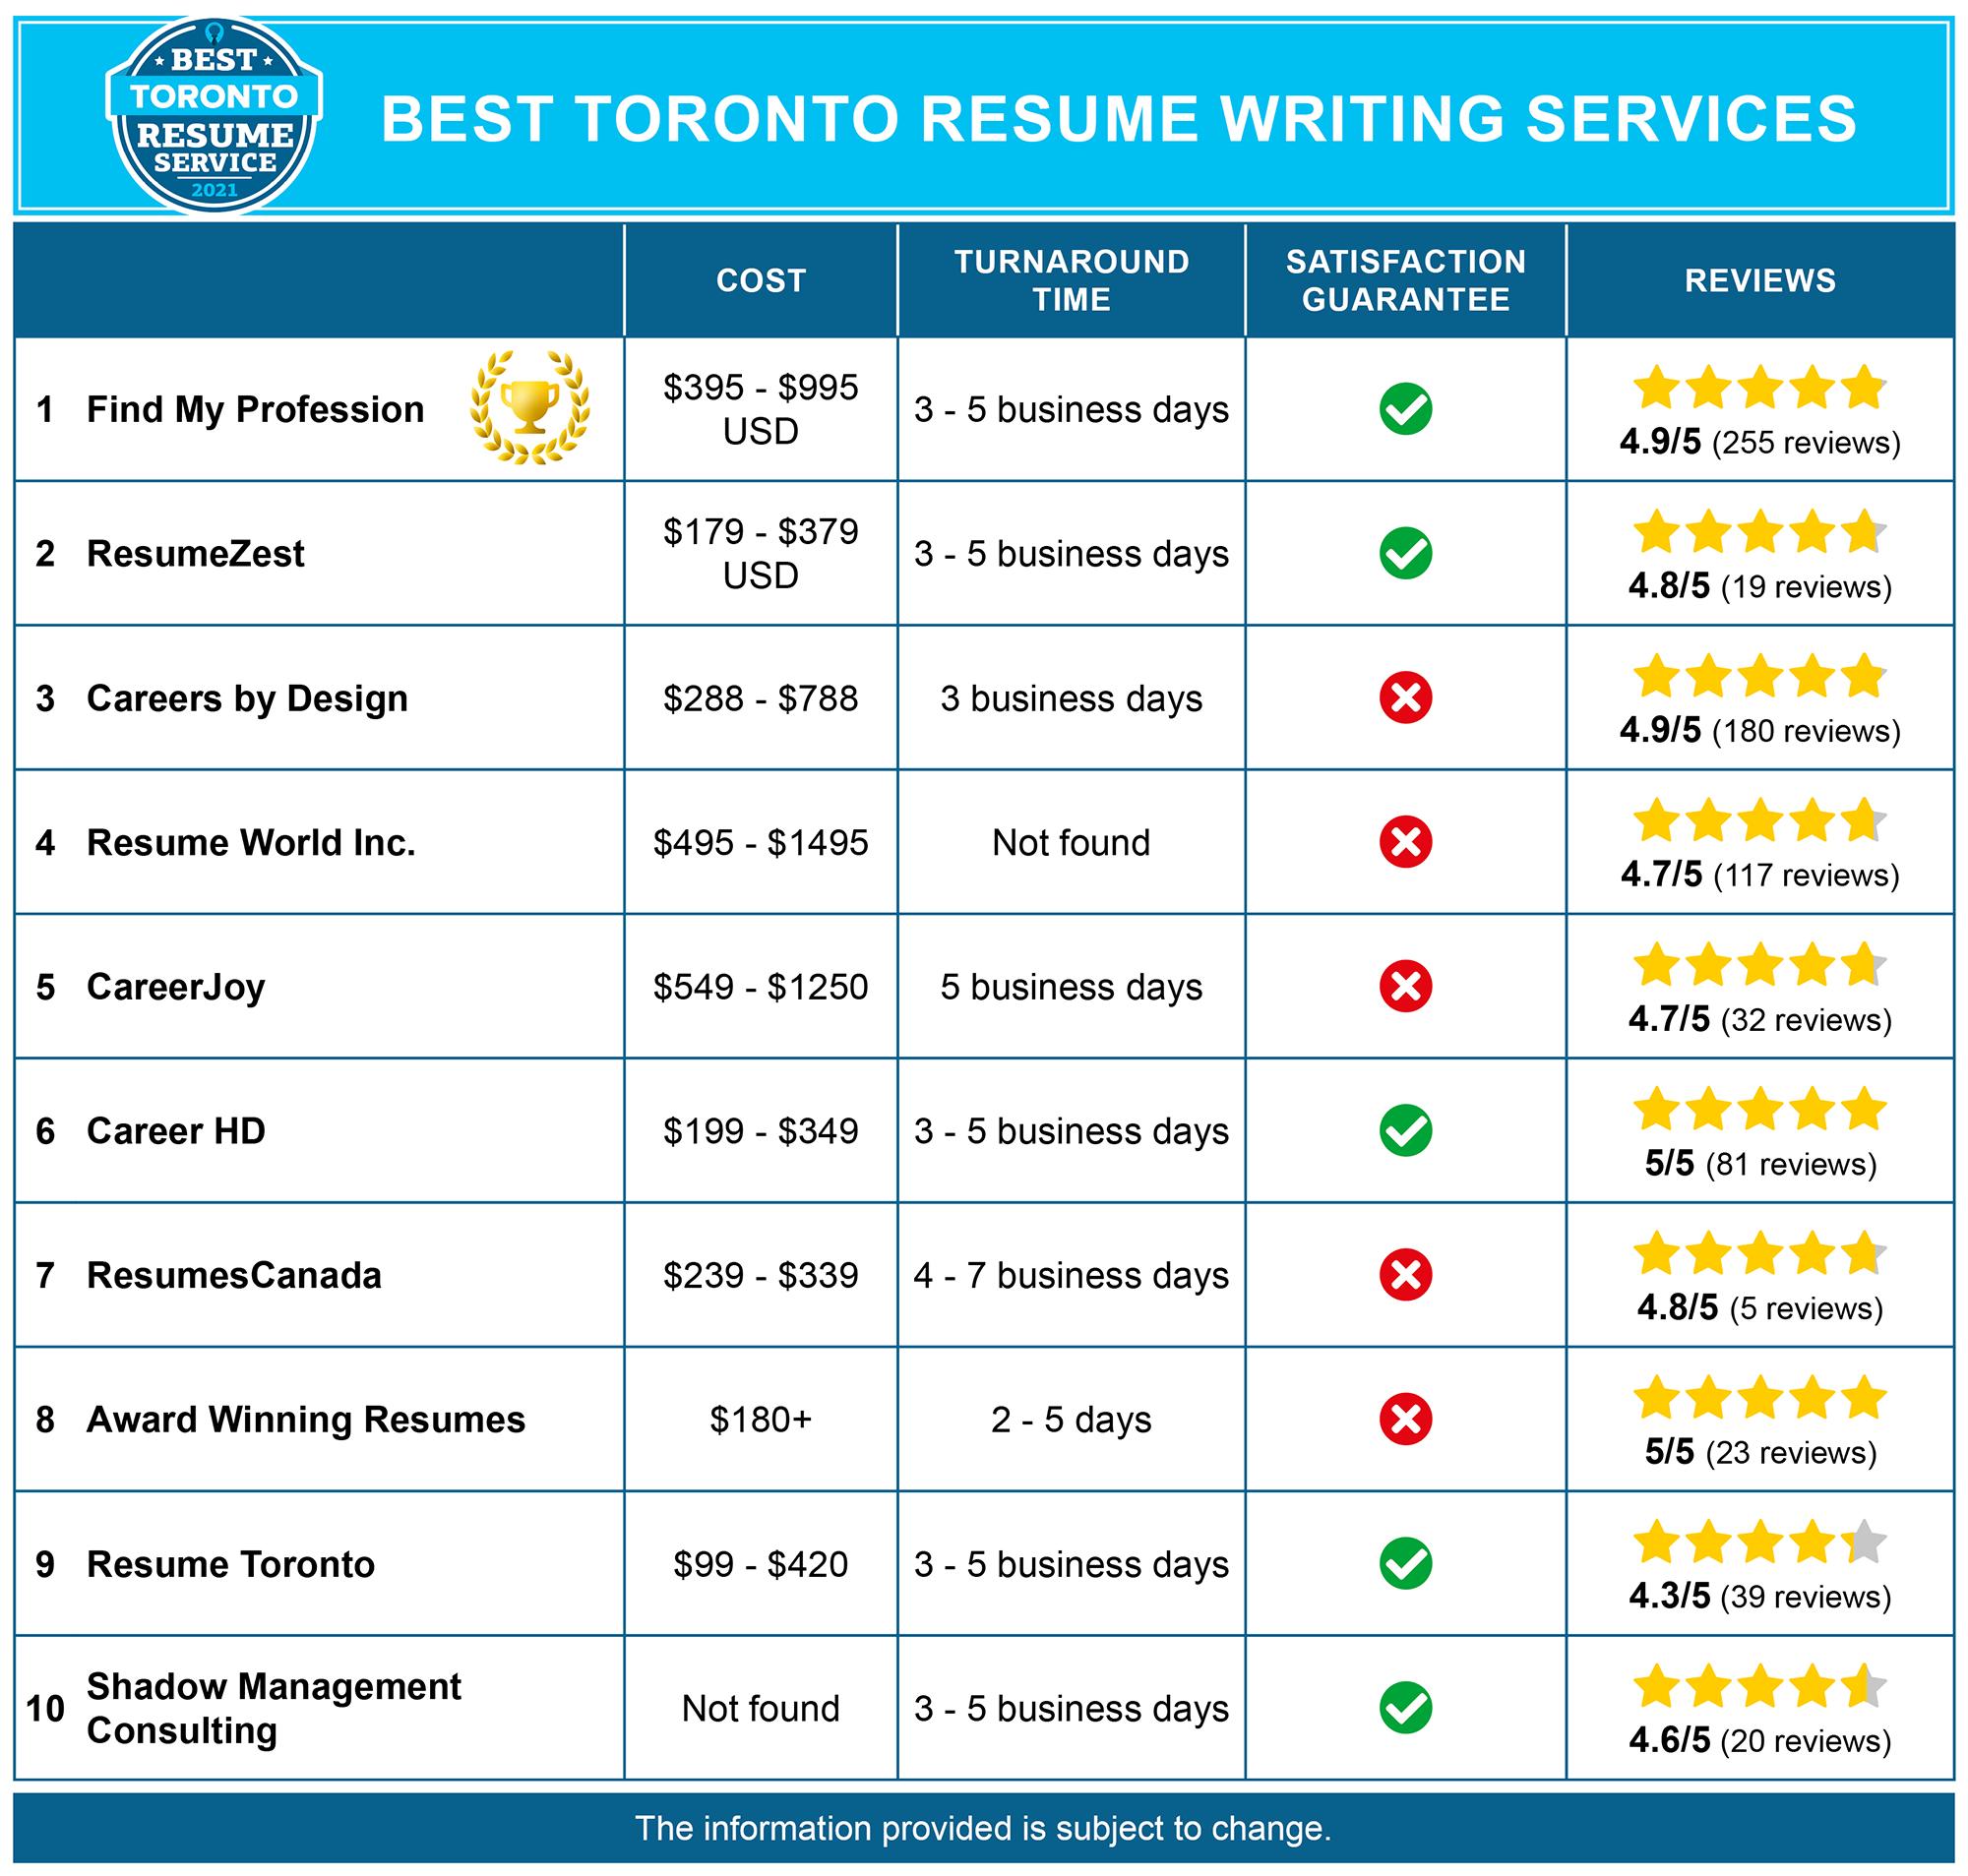 Best Toronto Resume Services